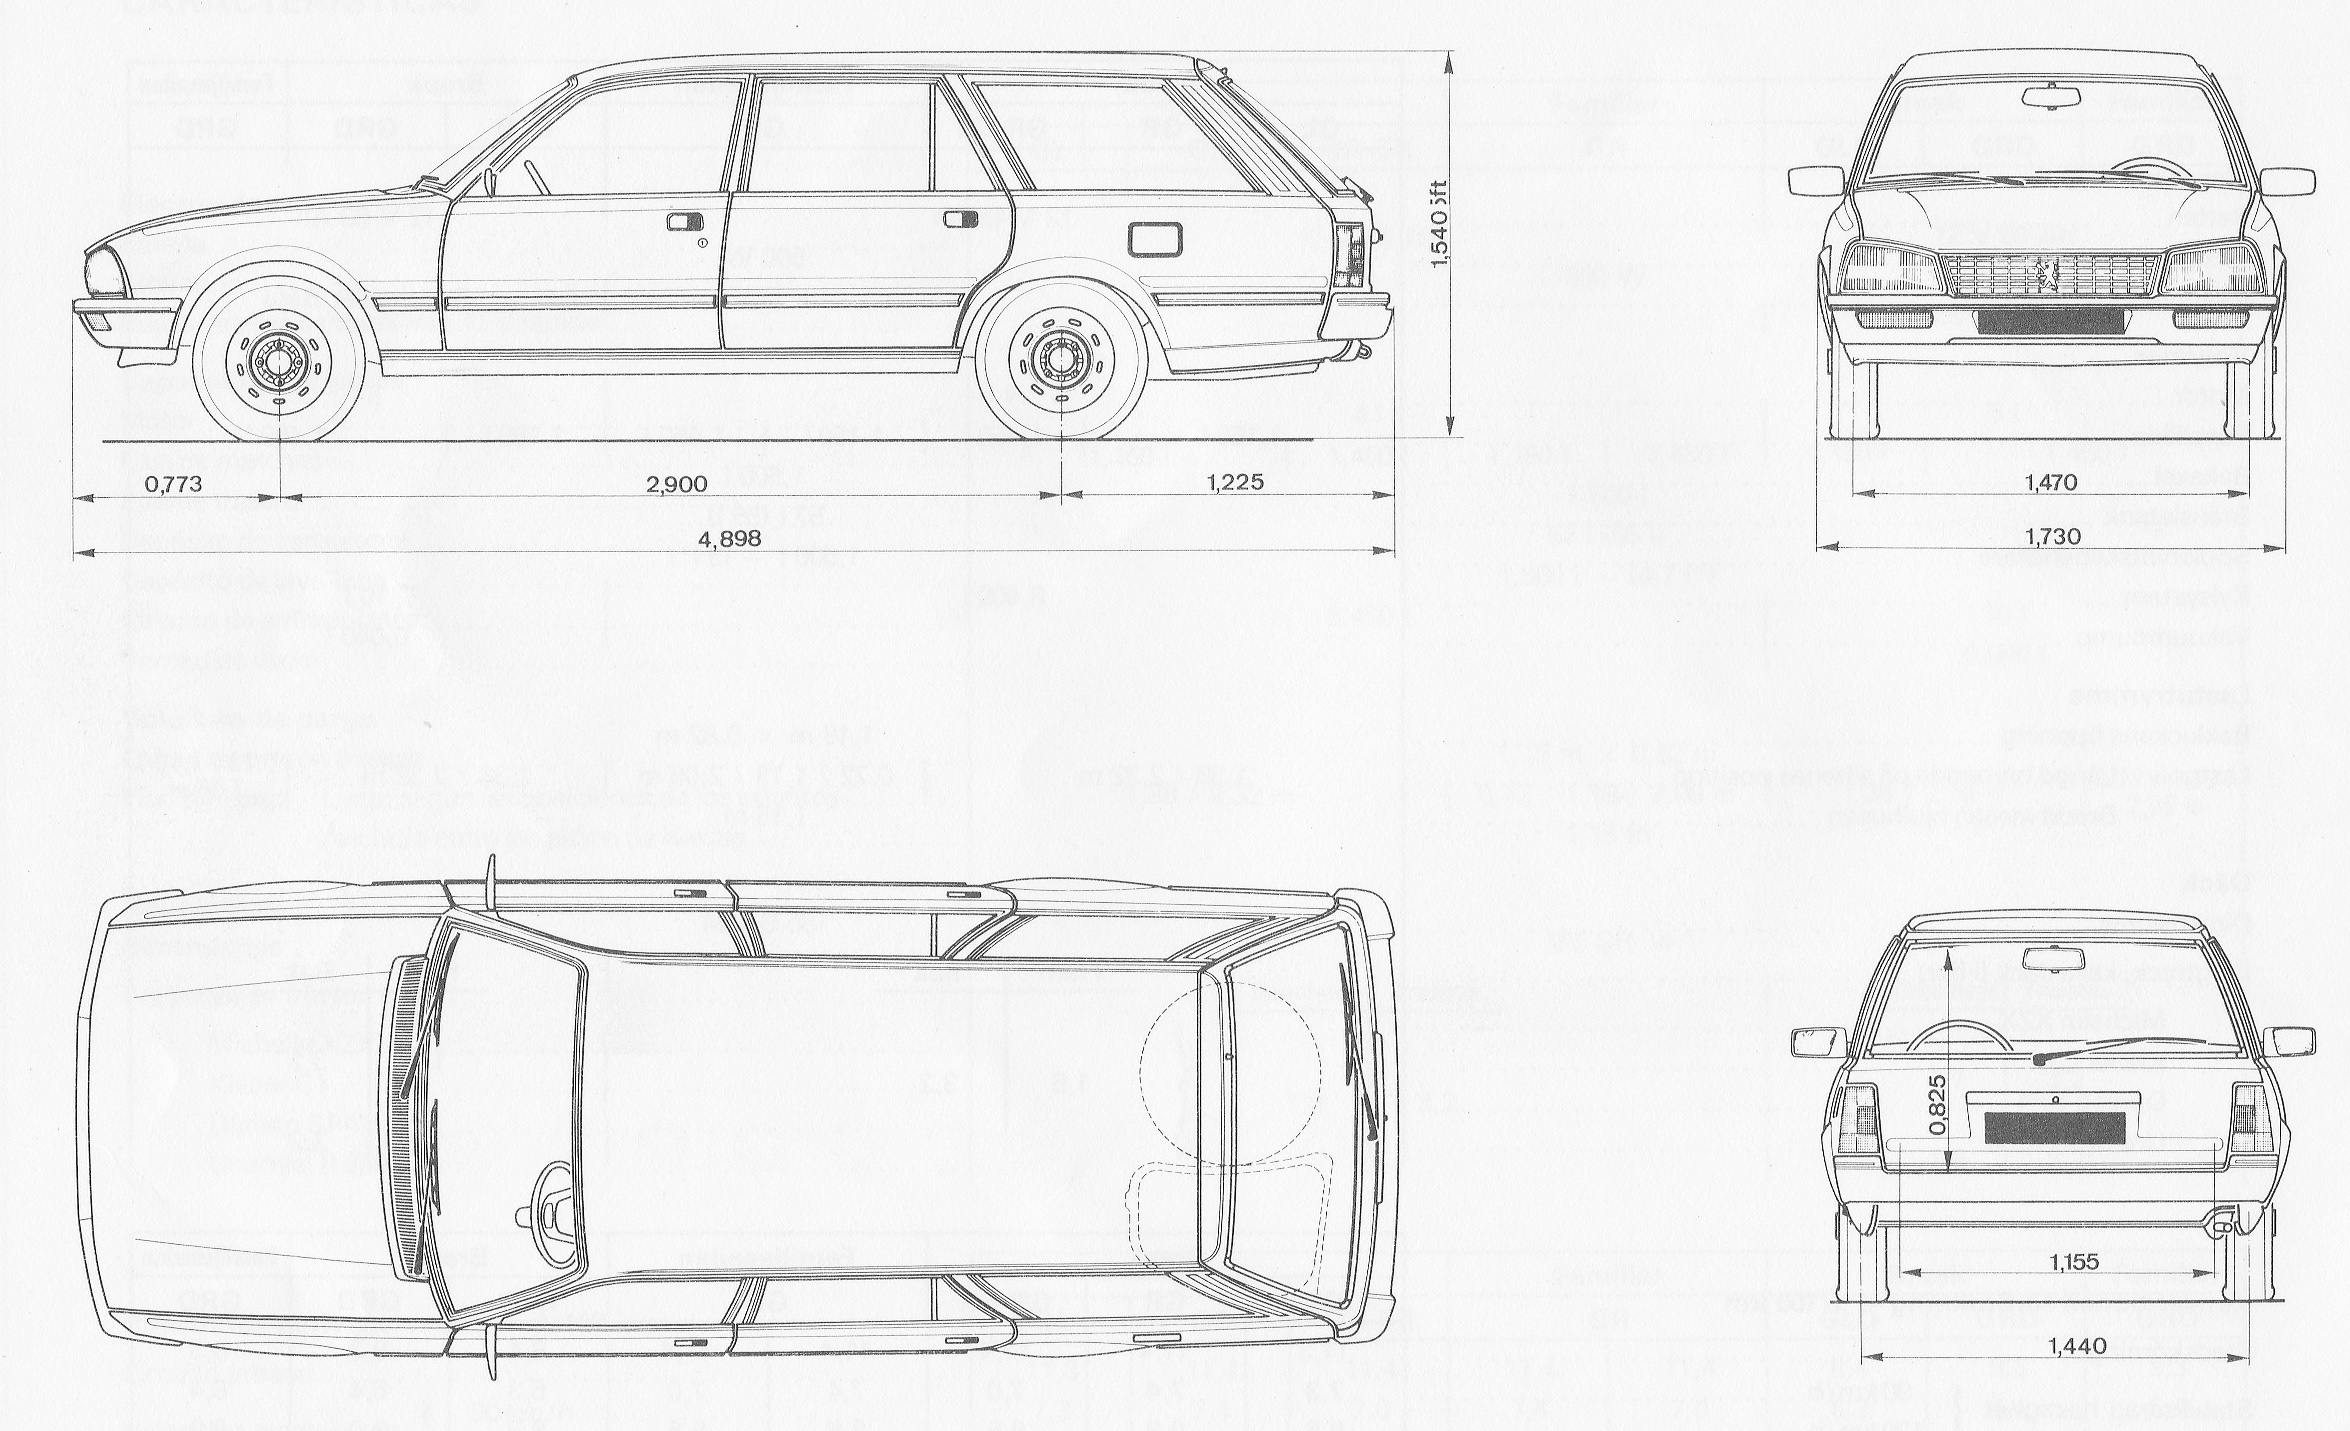 Peugeot 505 blueprint